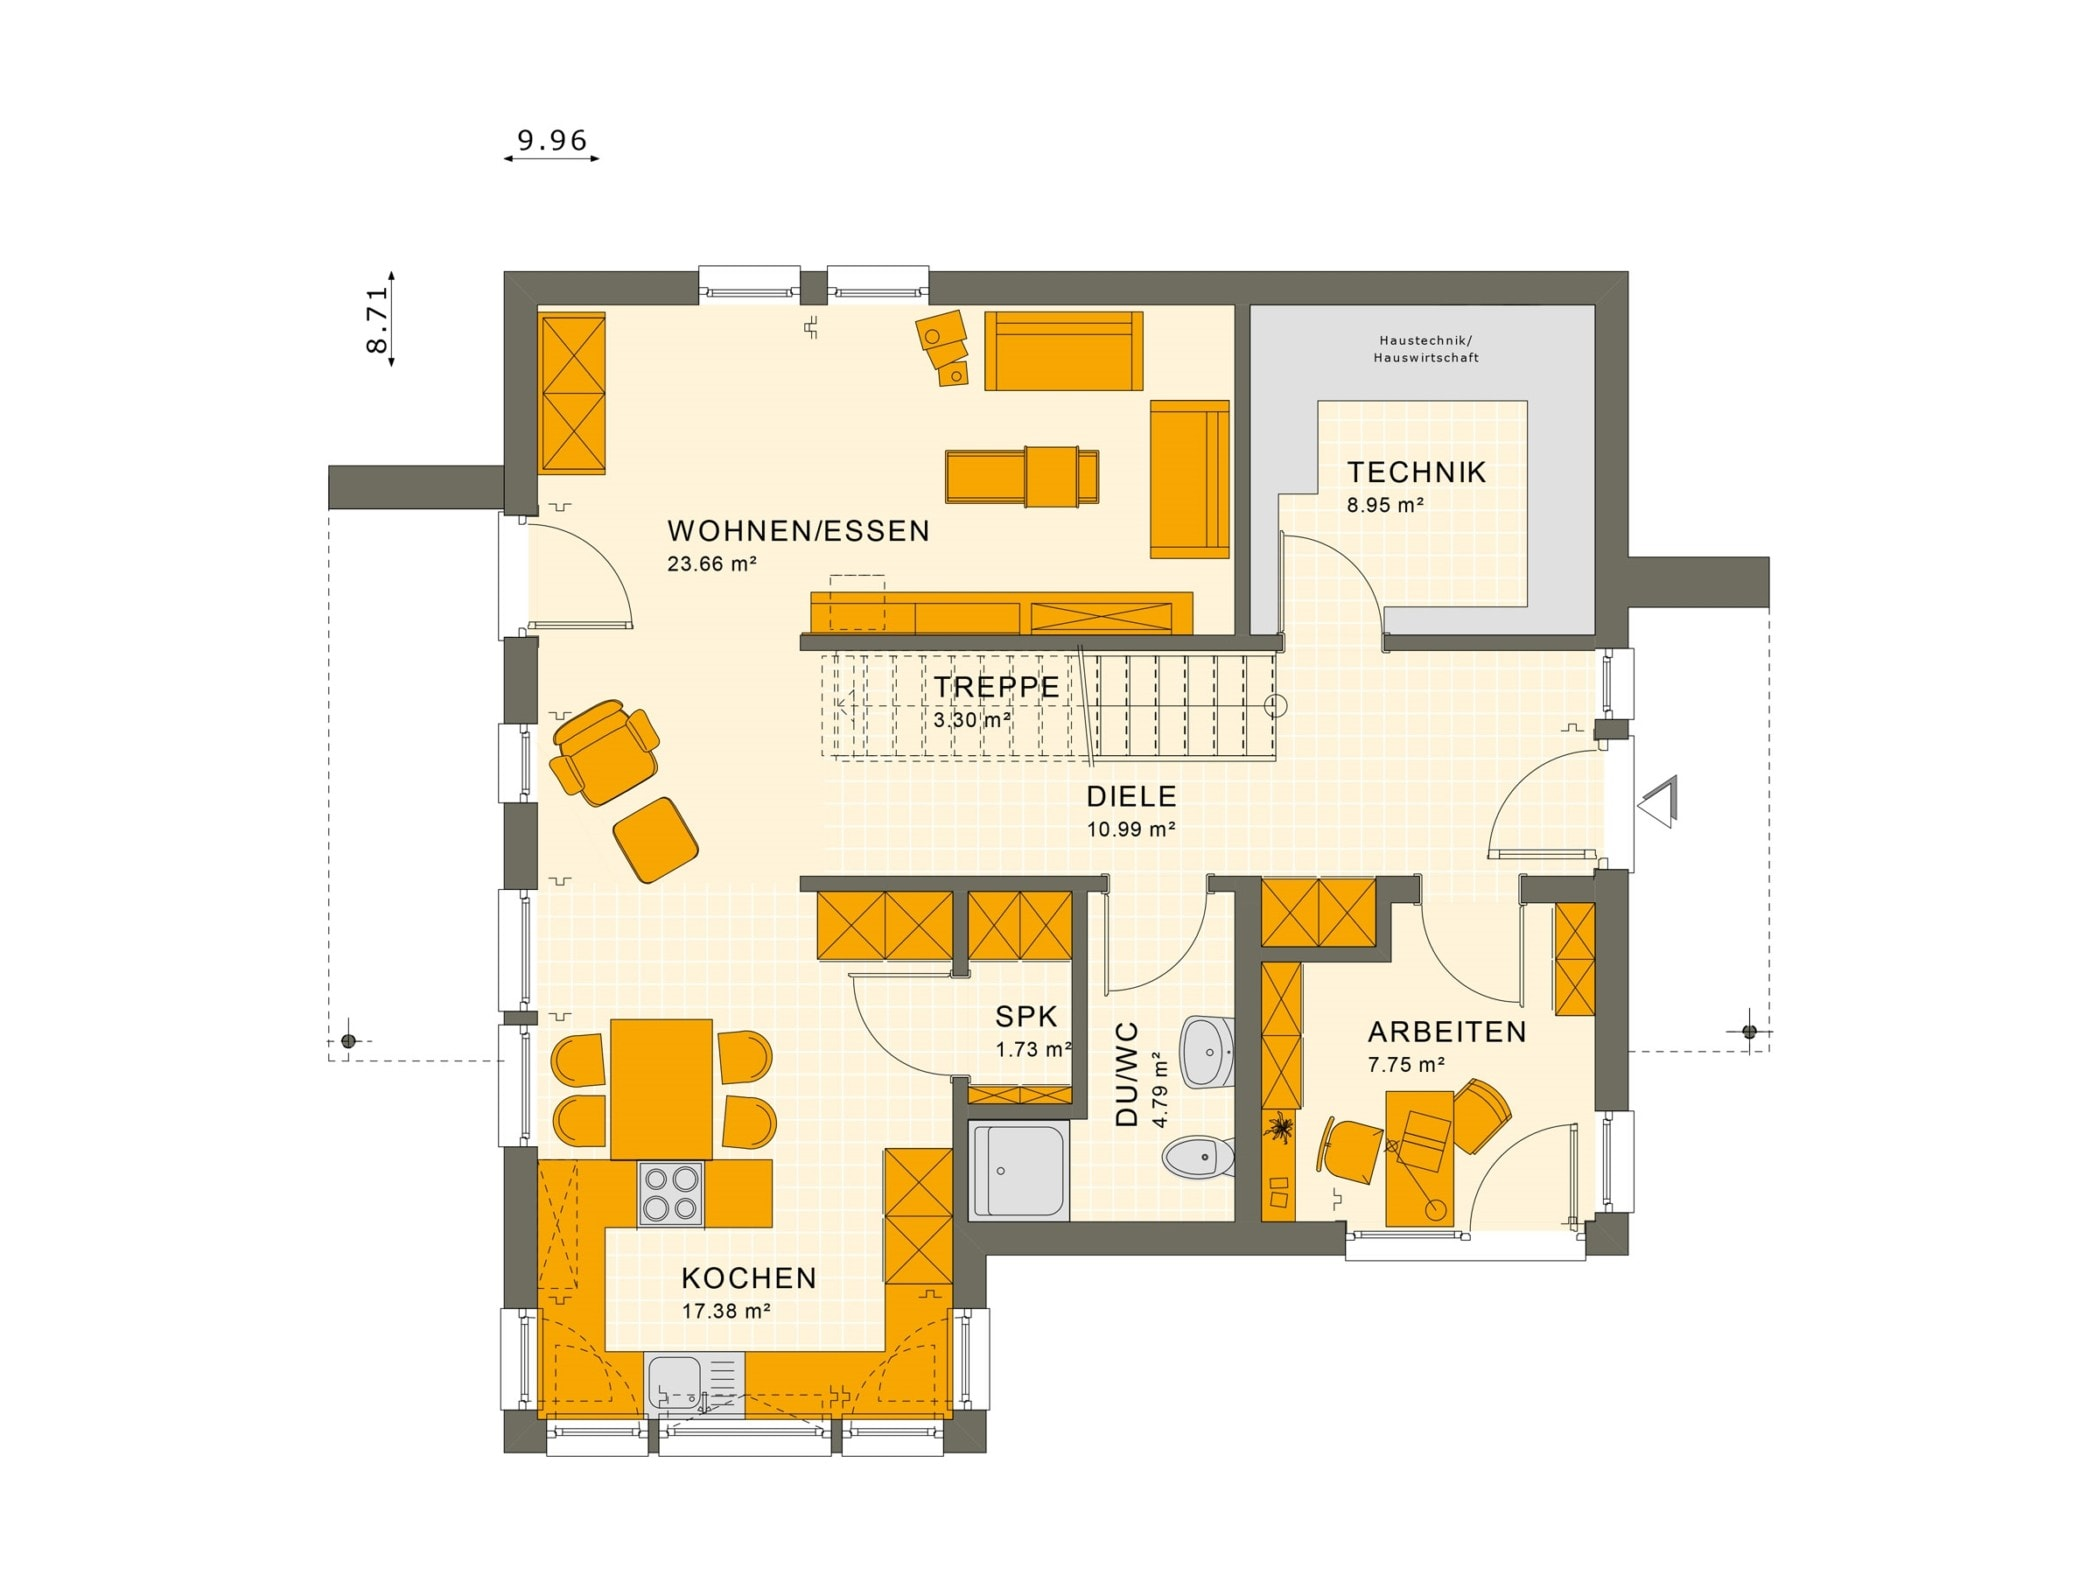 Grundriss Einfamilienhaus Erdgeschoss offen, gerade Treppe mittig - Fertighaus SUNSHINE 144 V5 von Living Haus - HausbauDirekt.de